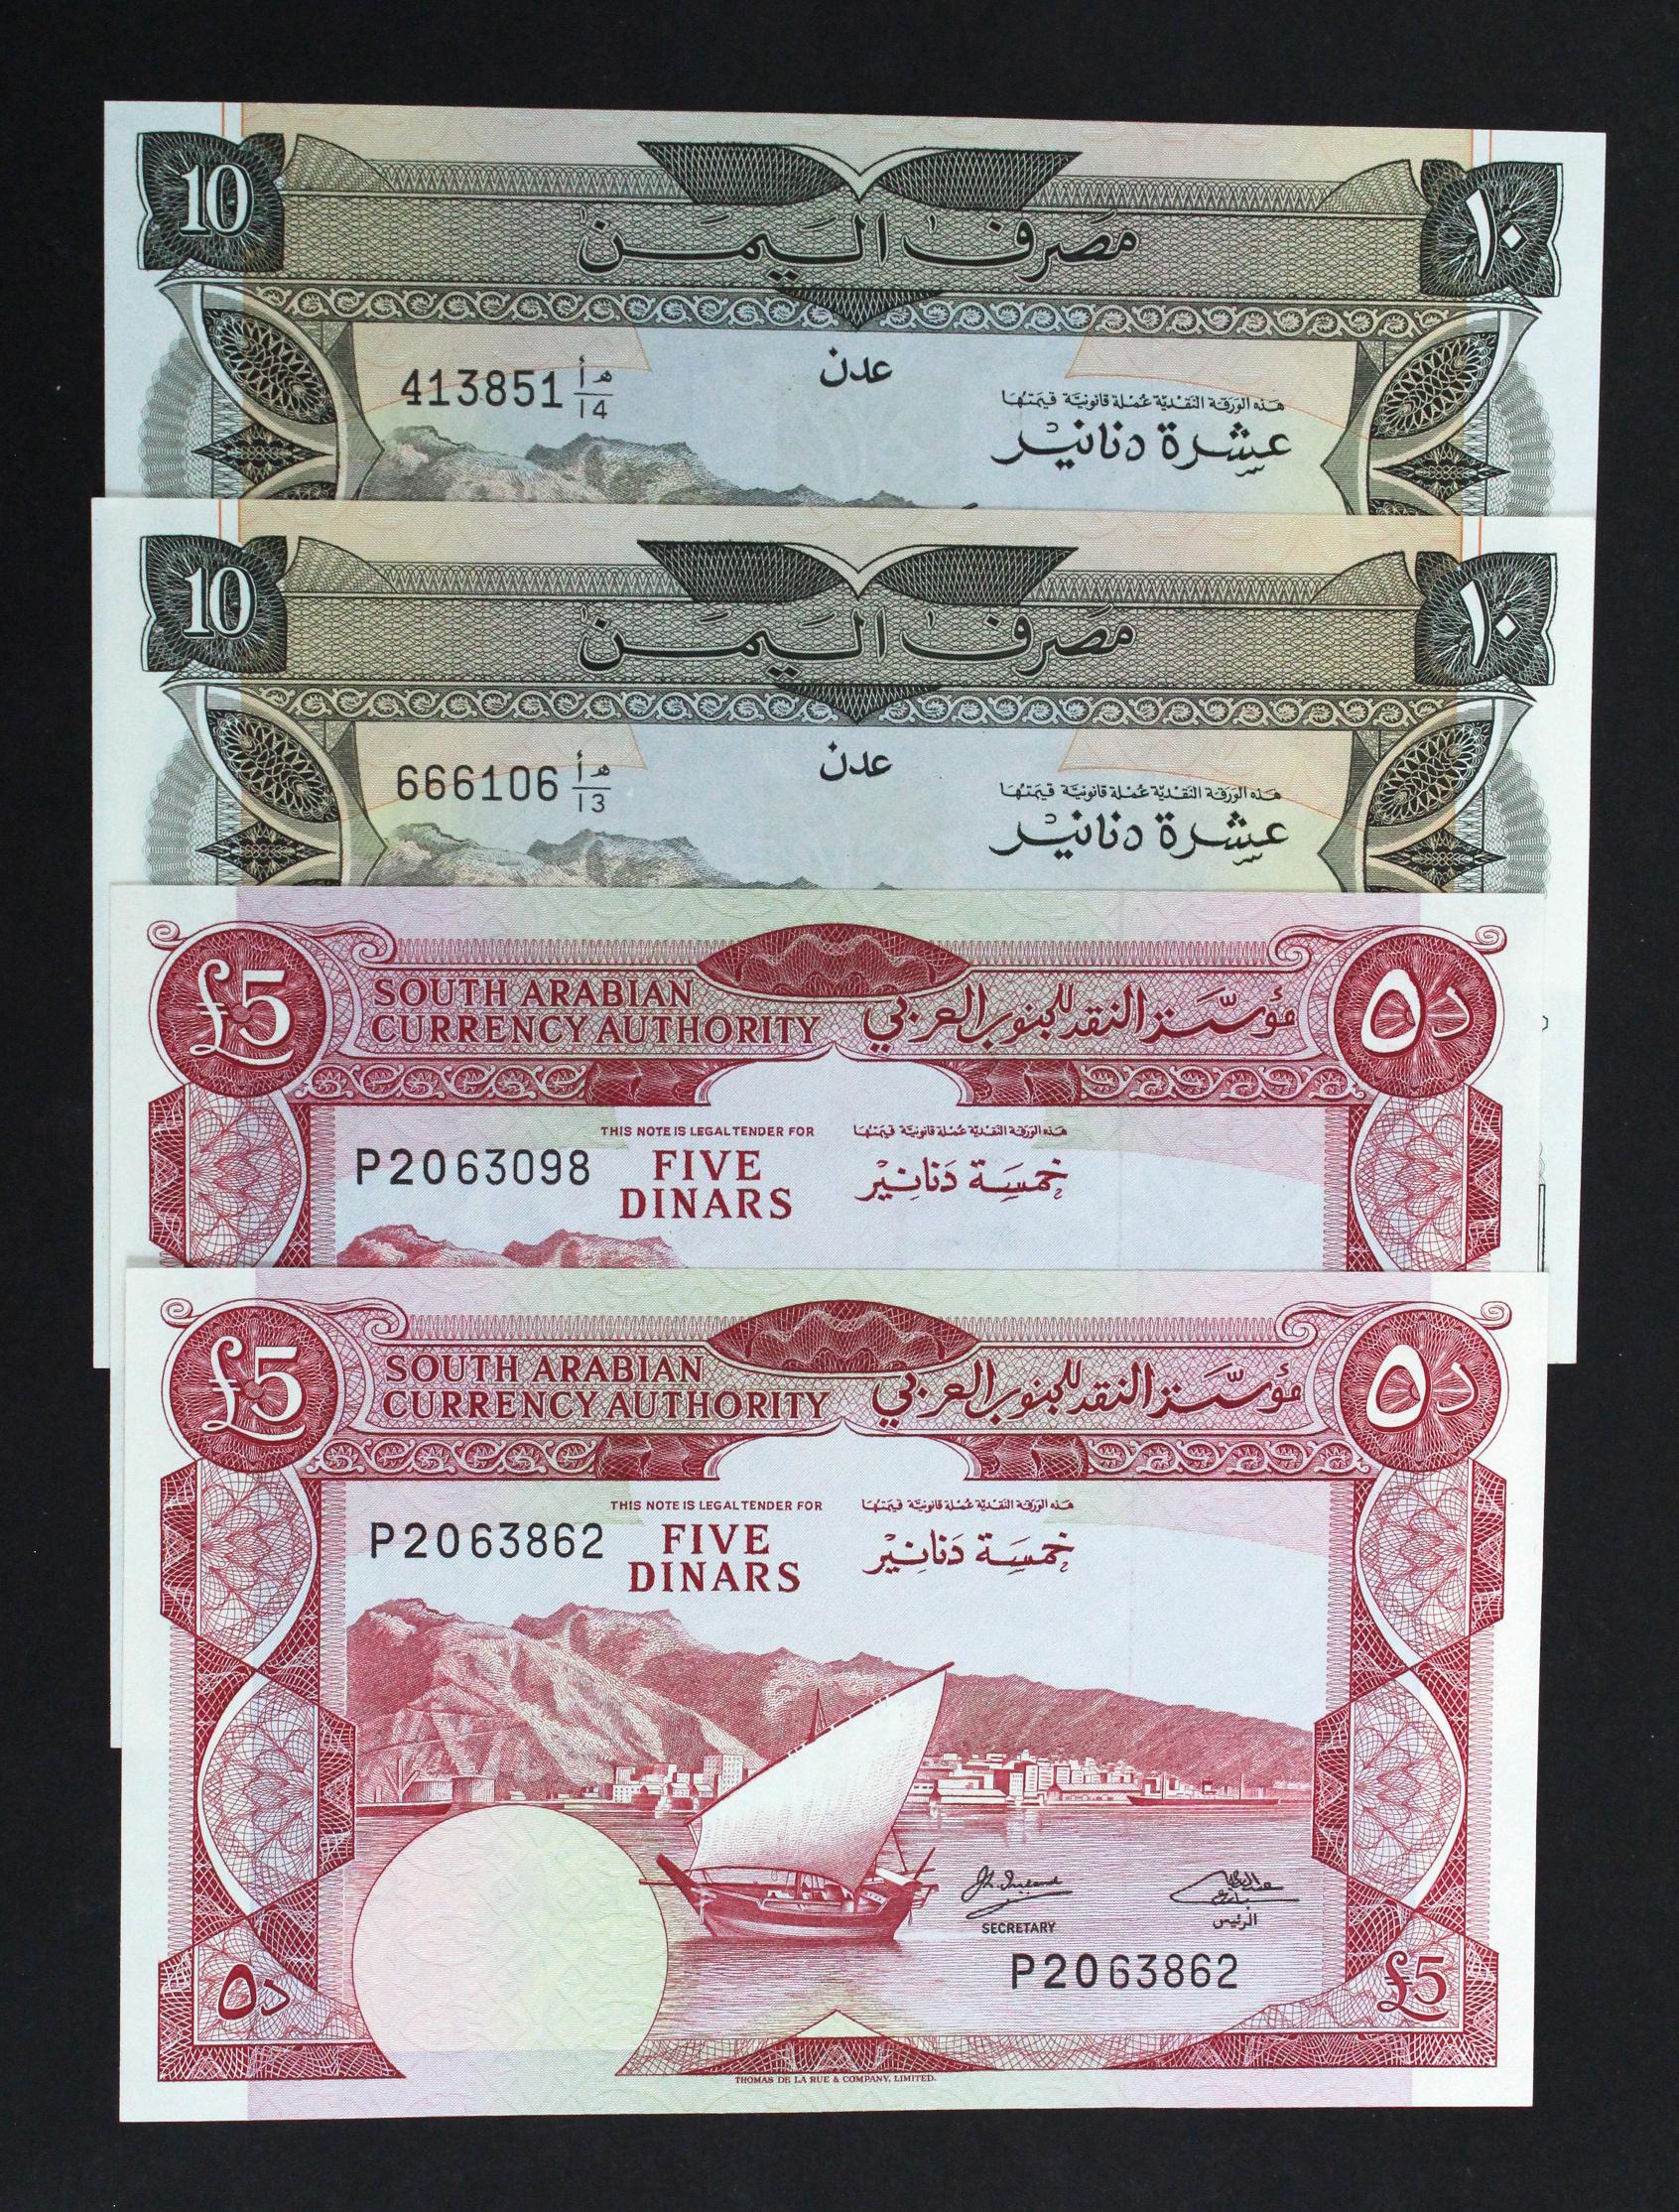 Yemen Democratic Republic (4) 10 Dinars issued 1984 (2), serial number 666106 and 413851 (TBB B104b,